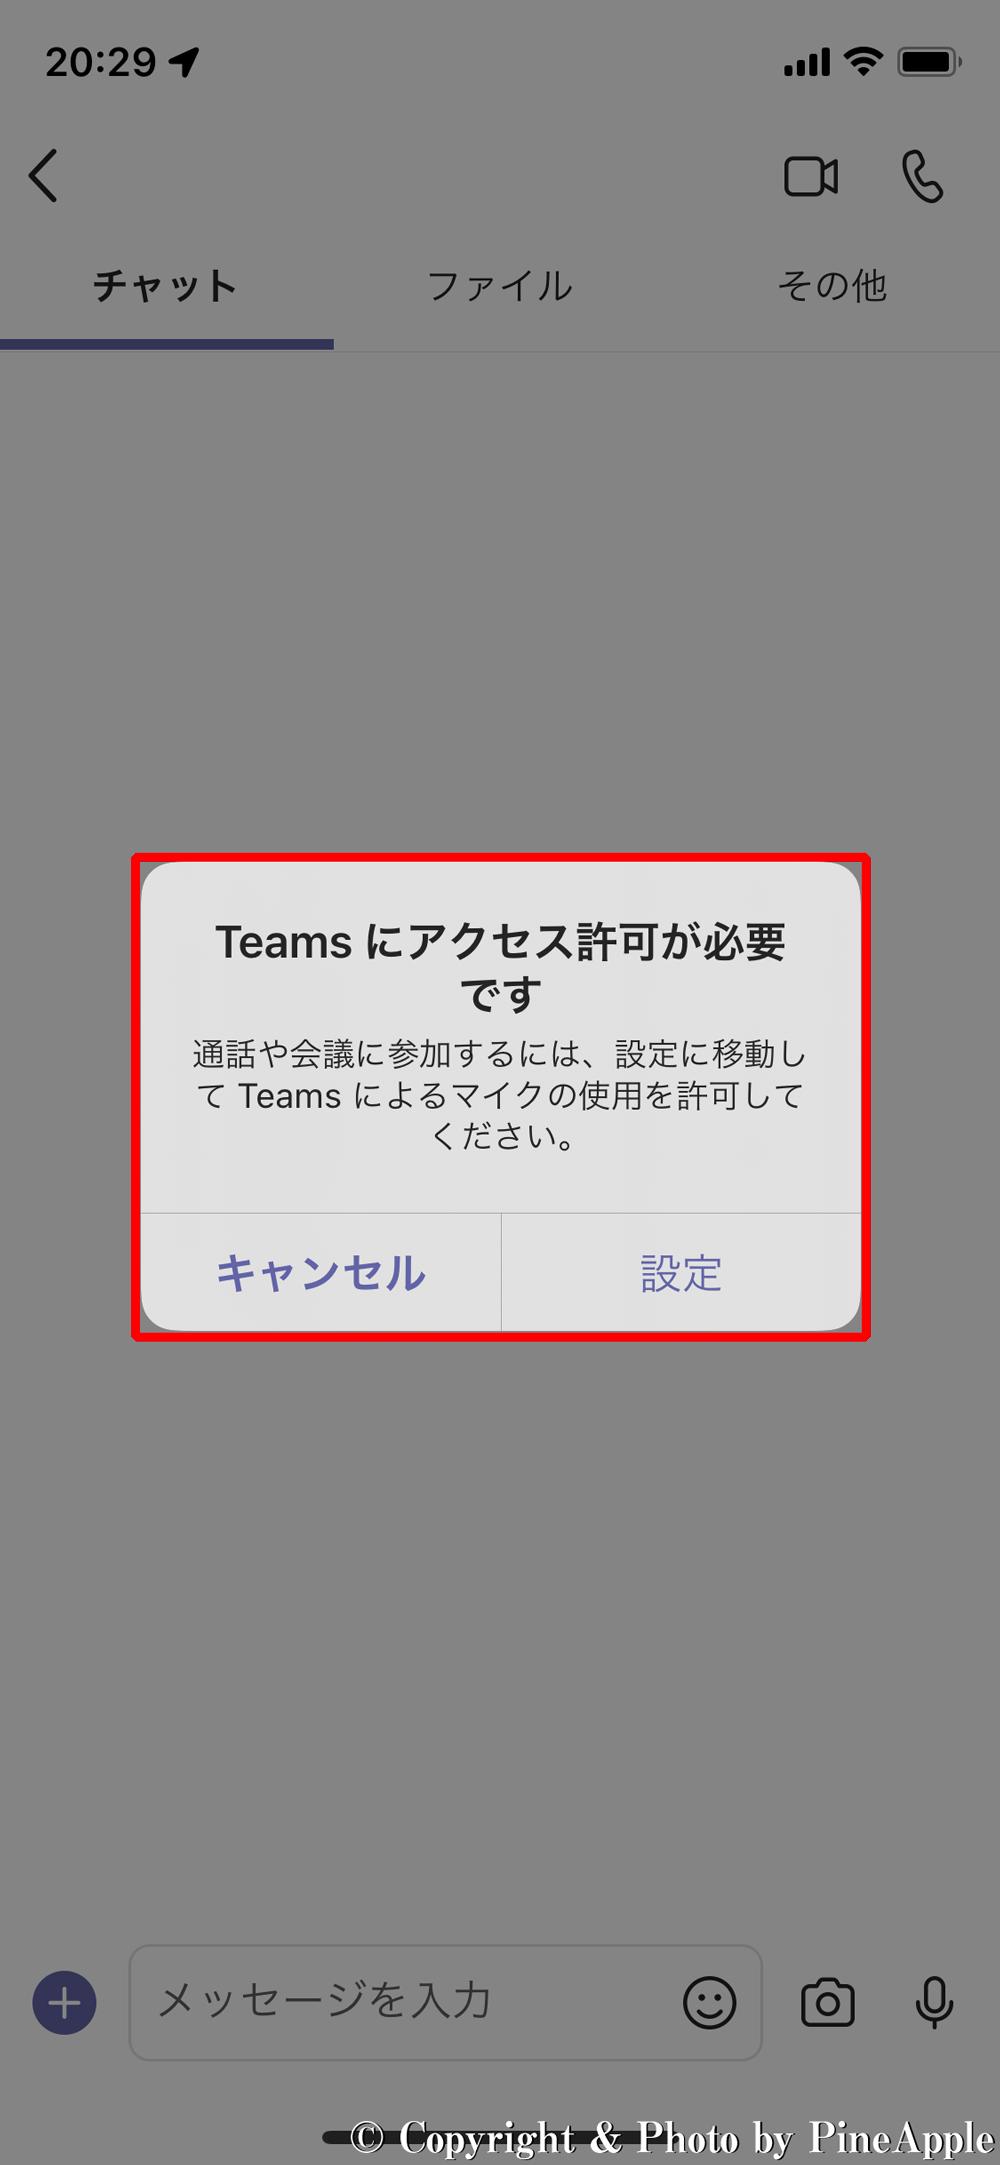 "Microsoft Teams:エラー メッセージ:""Teams にアクセス許可が必要です 通話を発信および受信するには、[設定] に移動して Teams によるネットワークへのアクセスを許可します"""